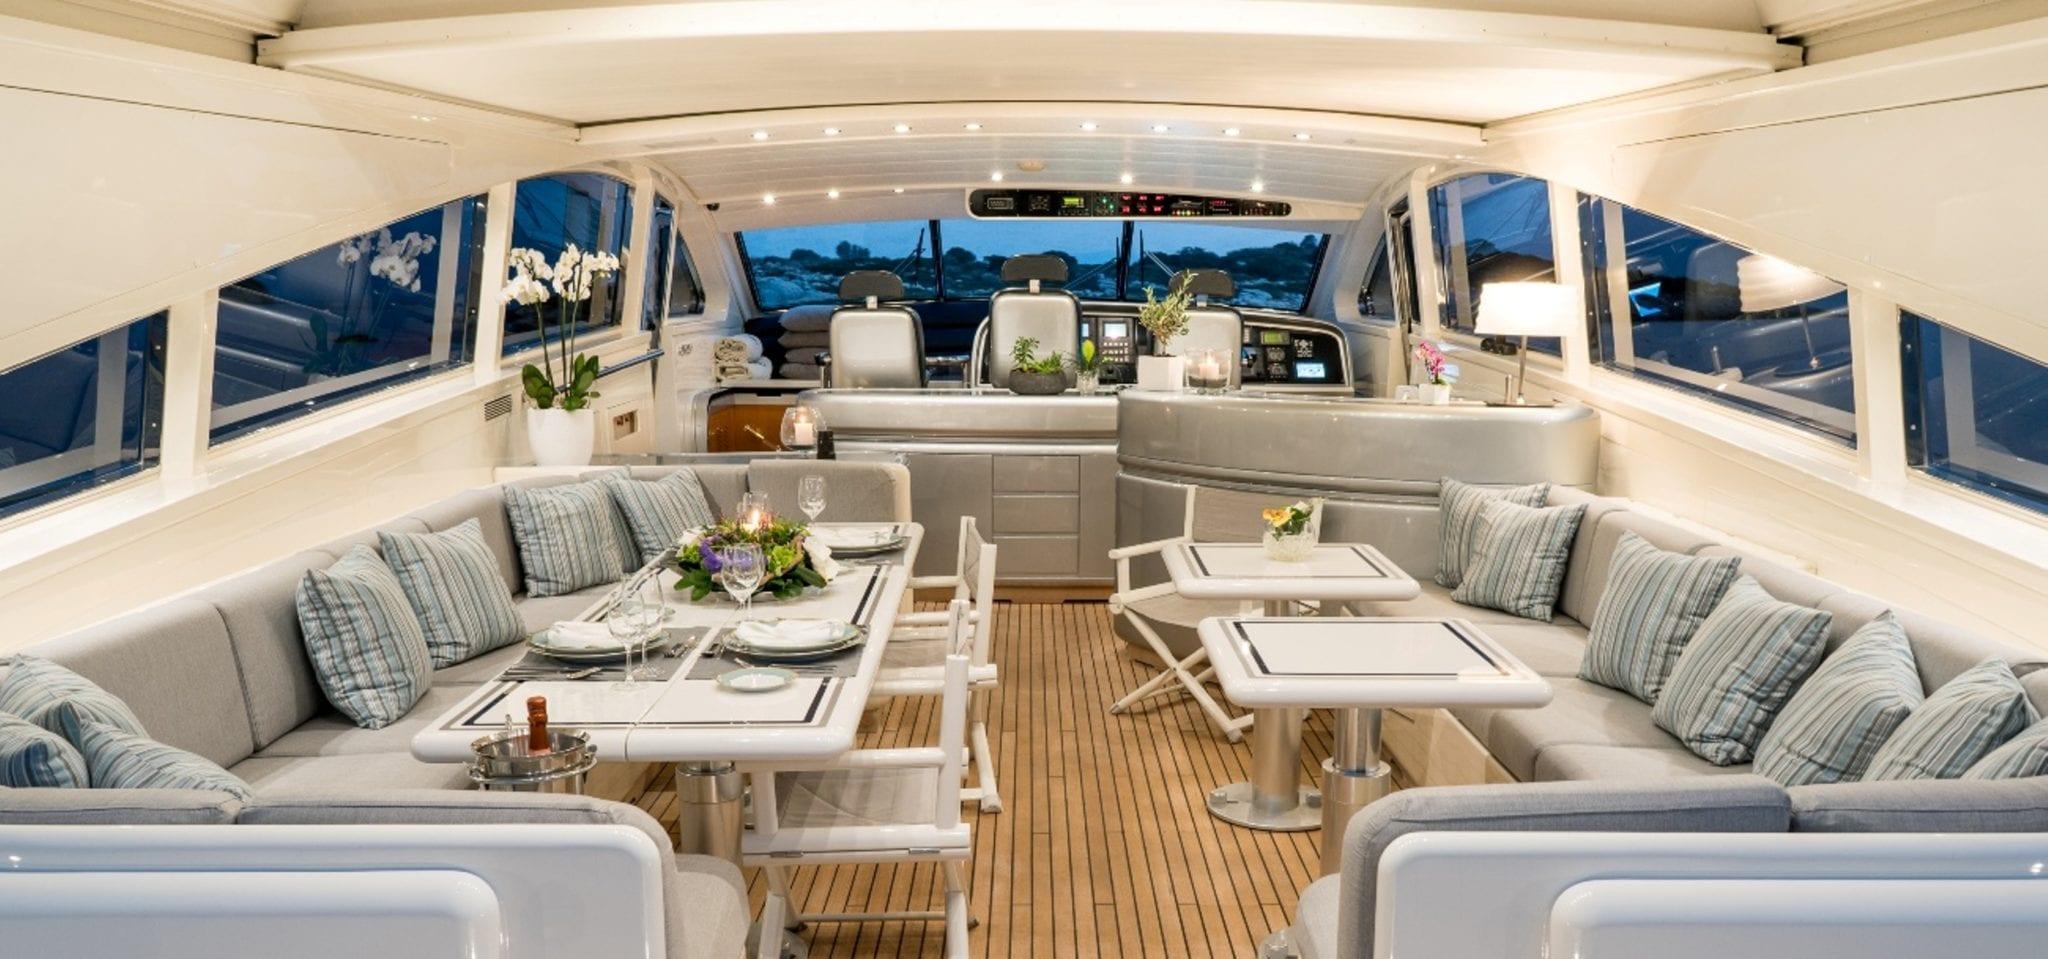 romachris ii motor yacht salon -  Valef Yachts Chartering - 4068